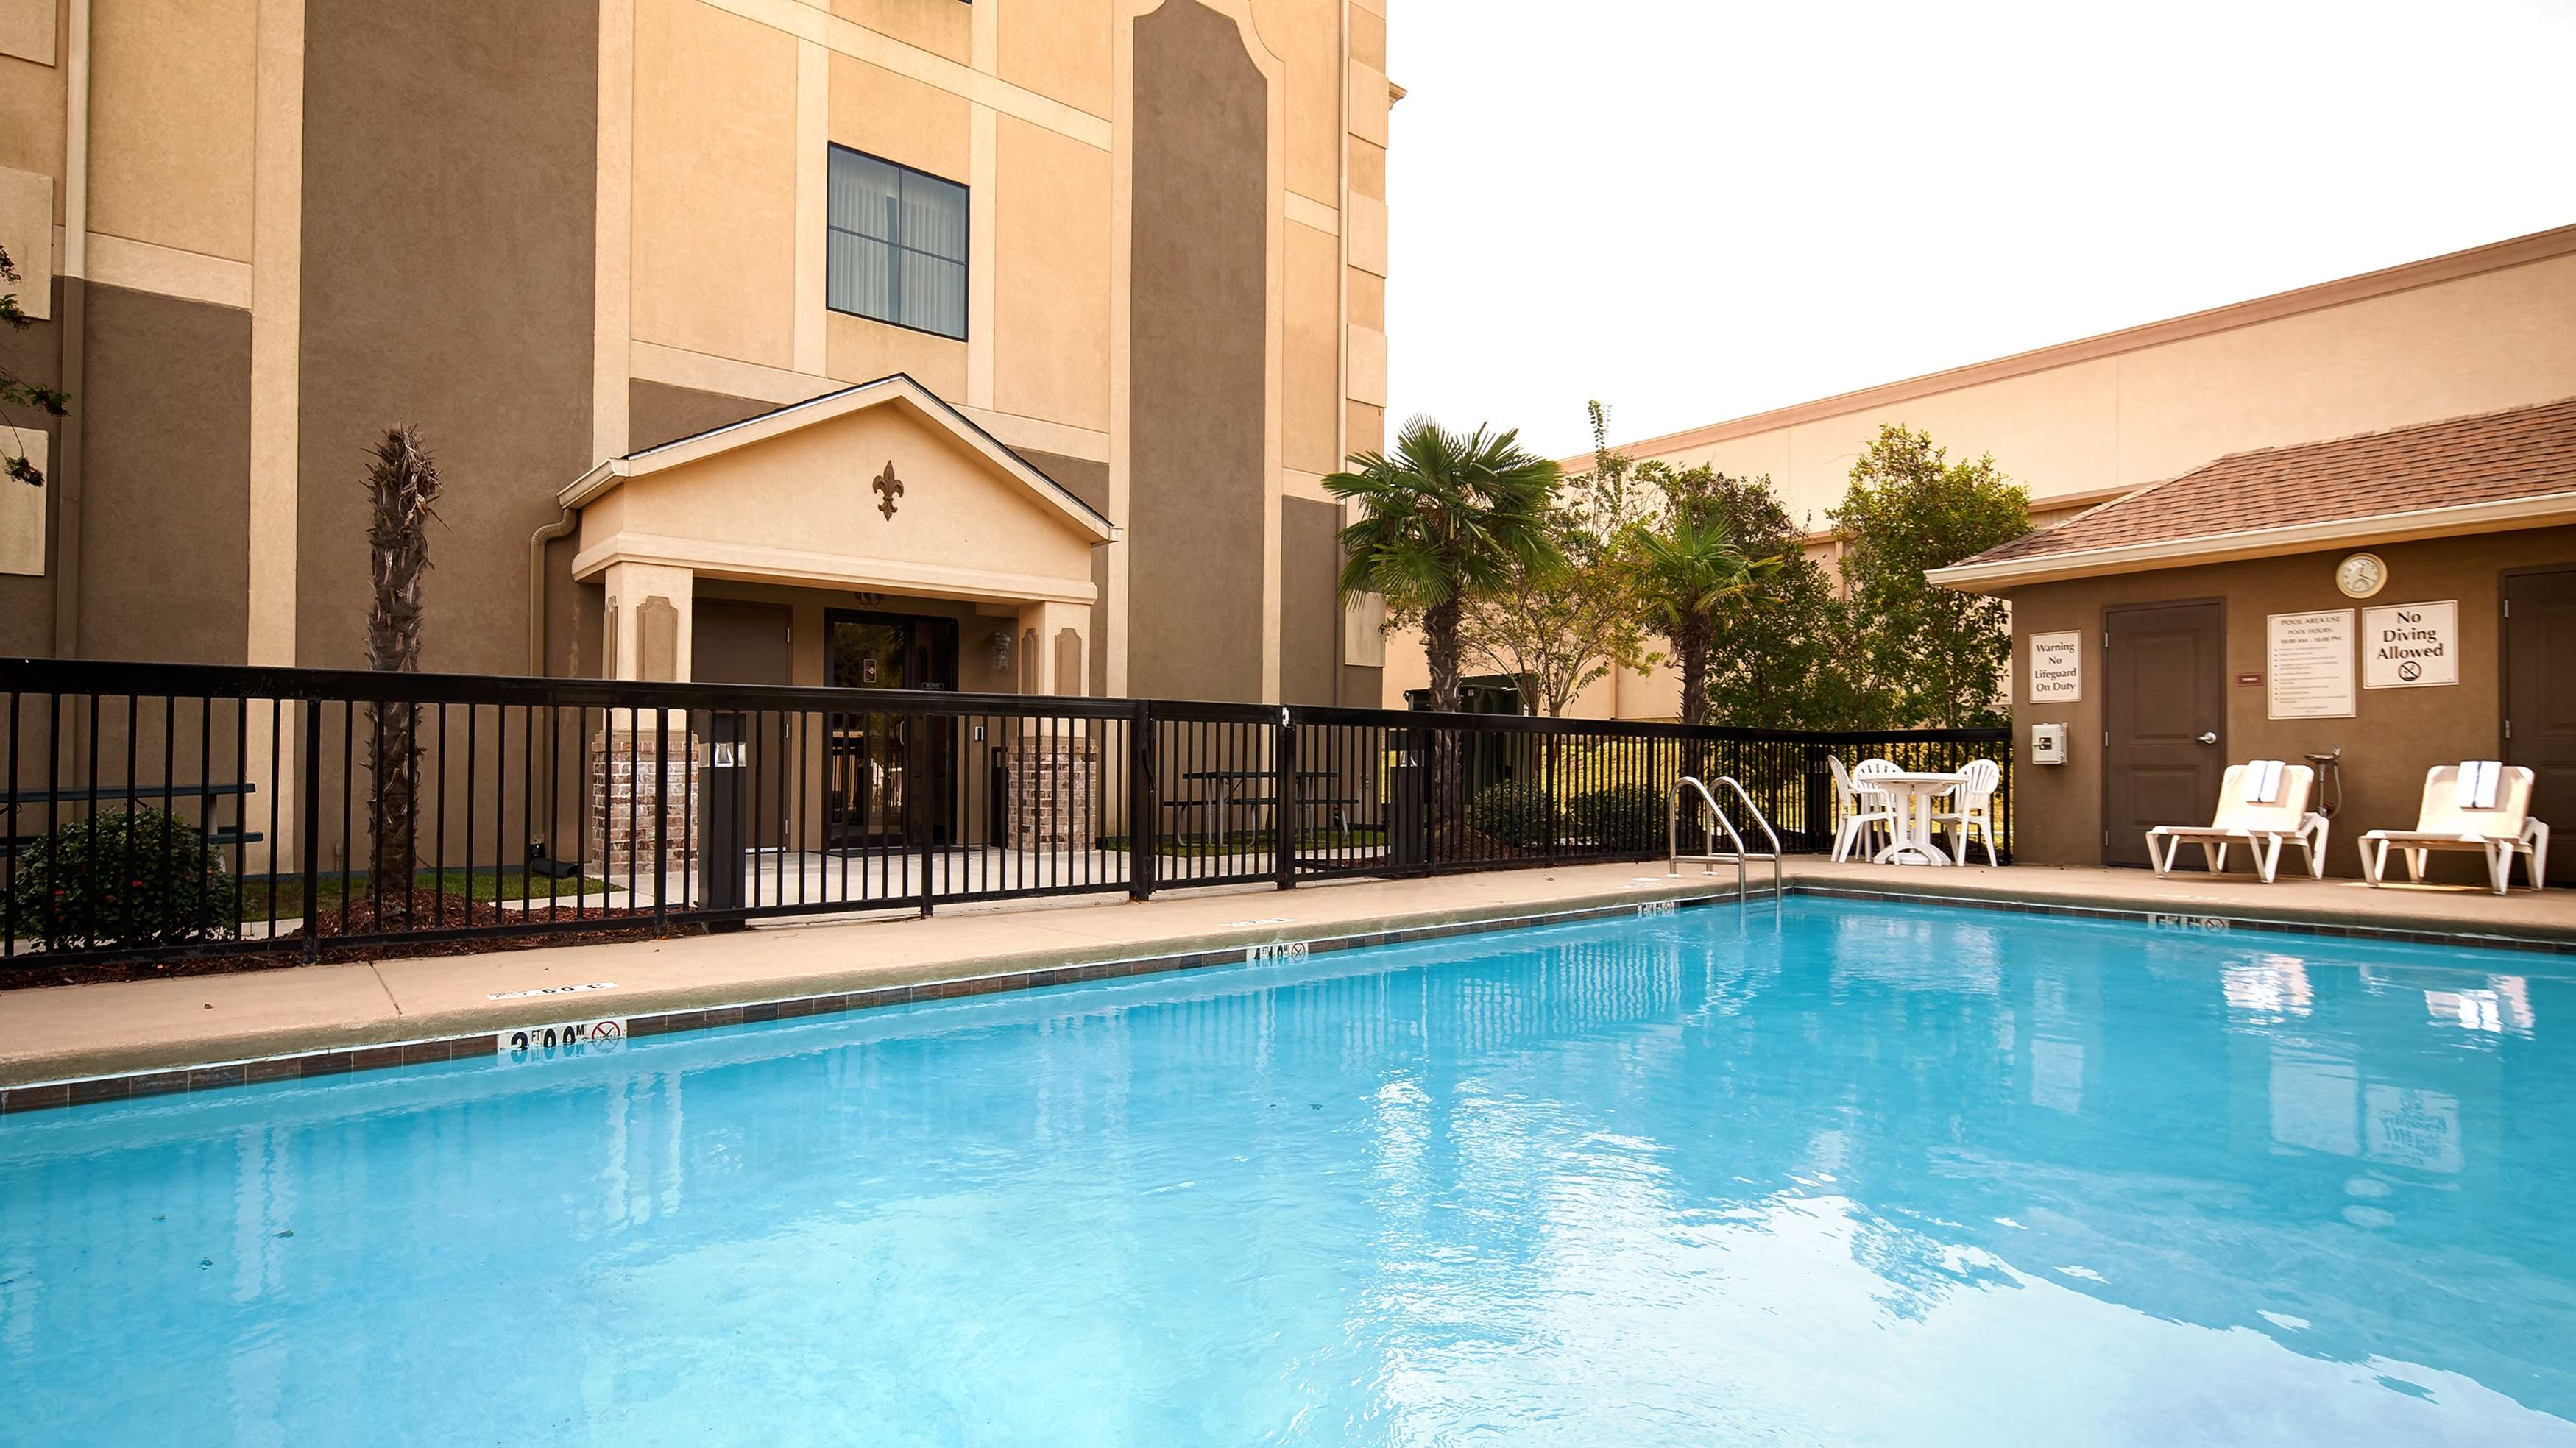 Best Western St. Francisville Hotel image 9